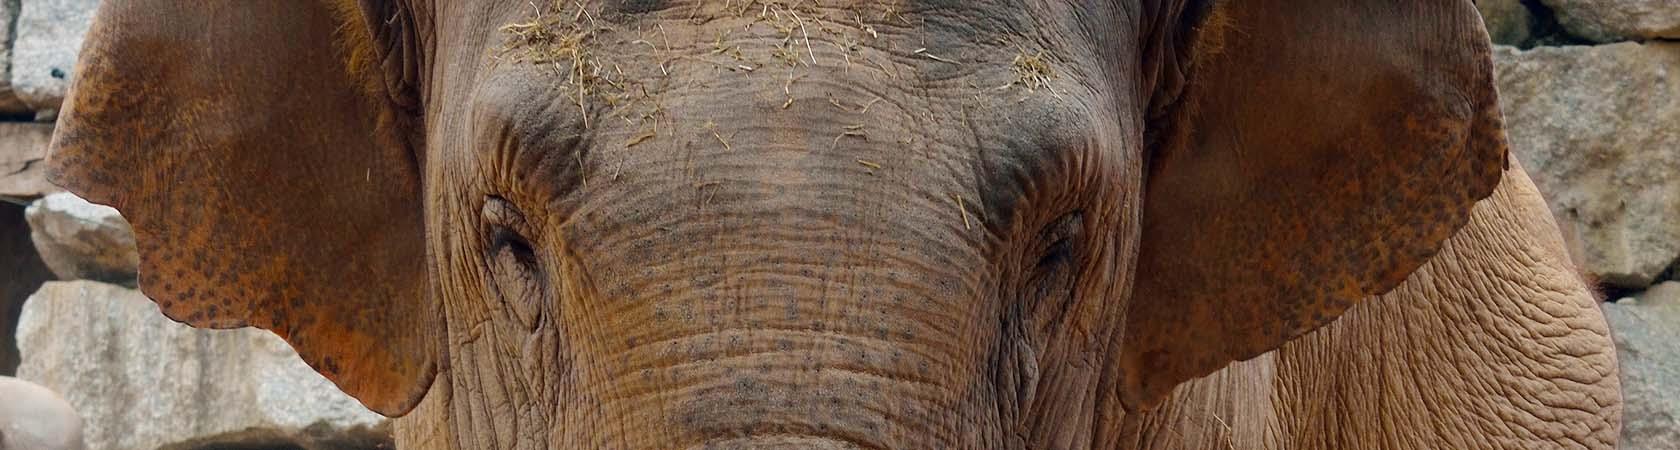 elefante-parco-faunistico-le-cornelle-leonardodelfini